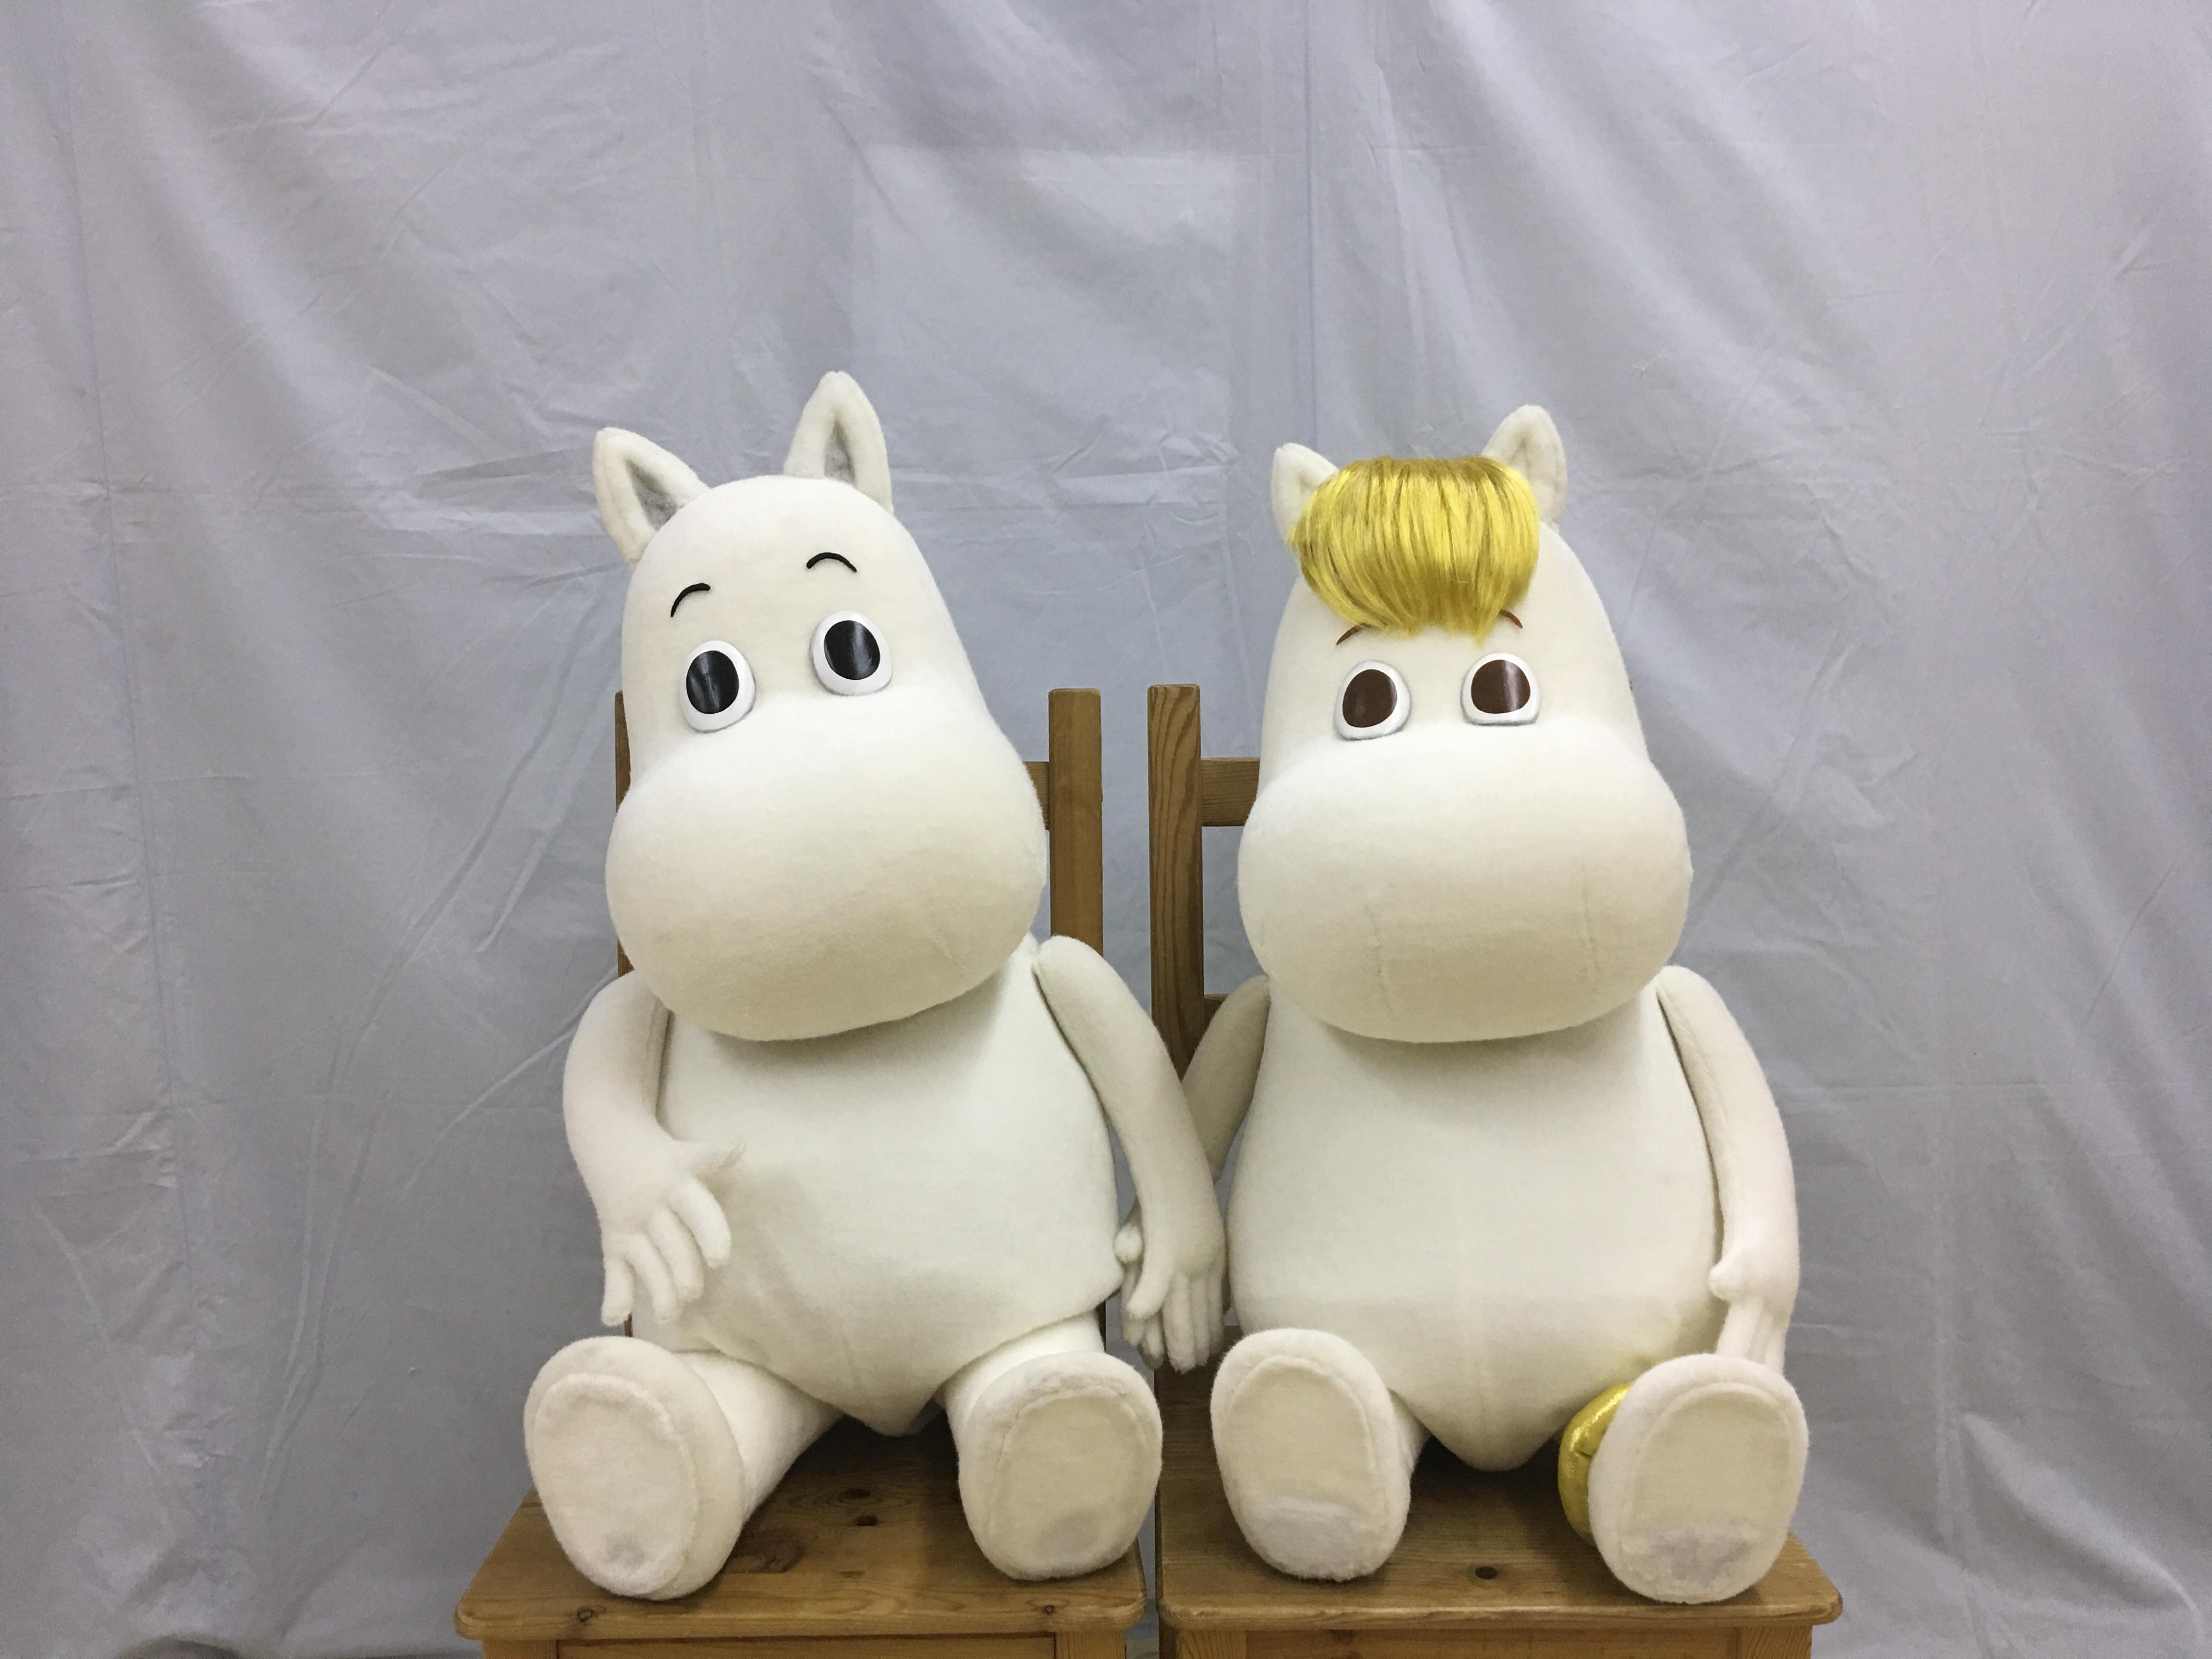 (C) Moomin Characters (TM)/人形製作:人形劇団ひとみ座